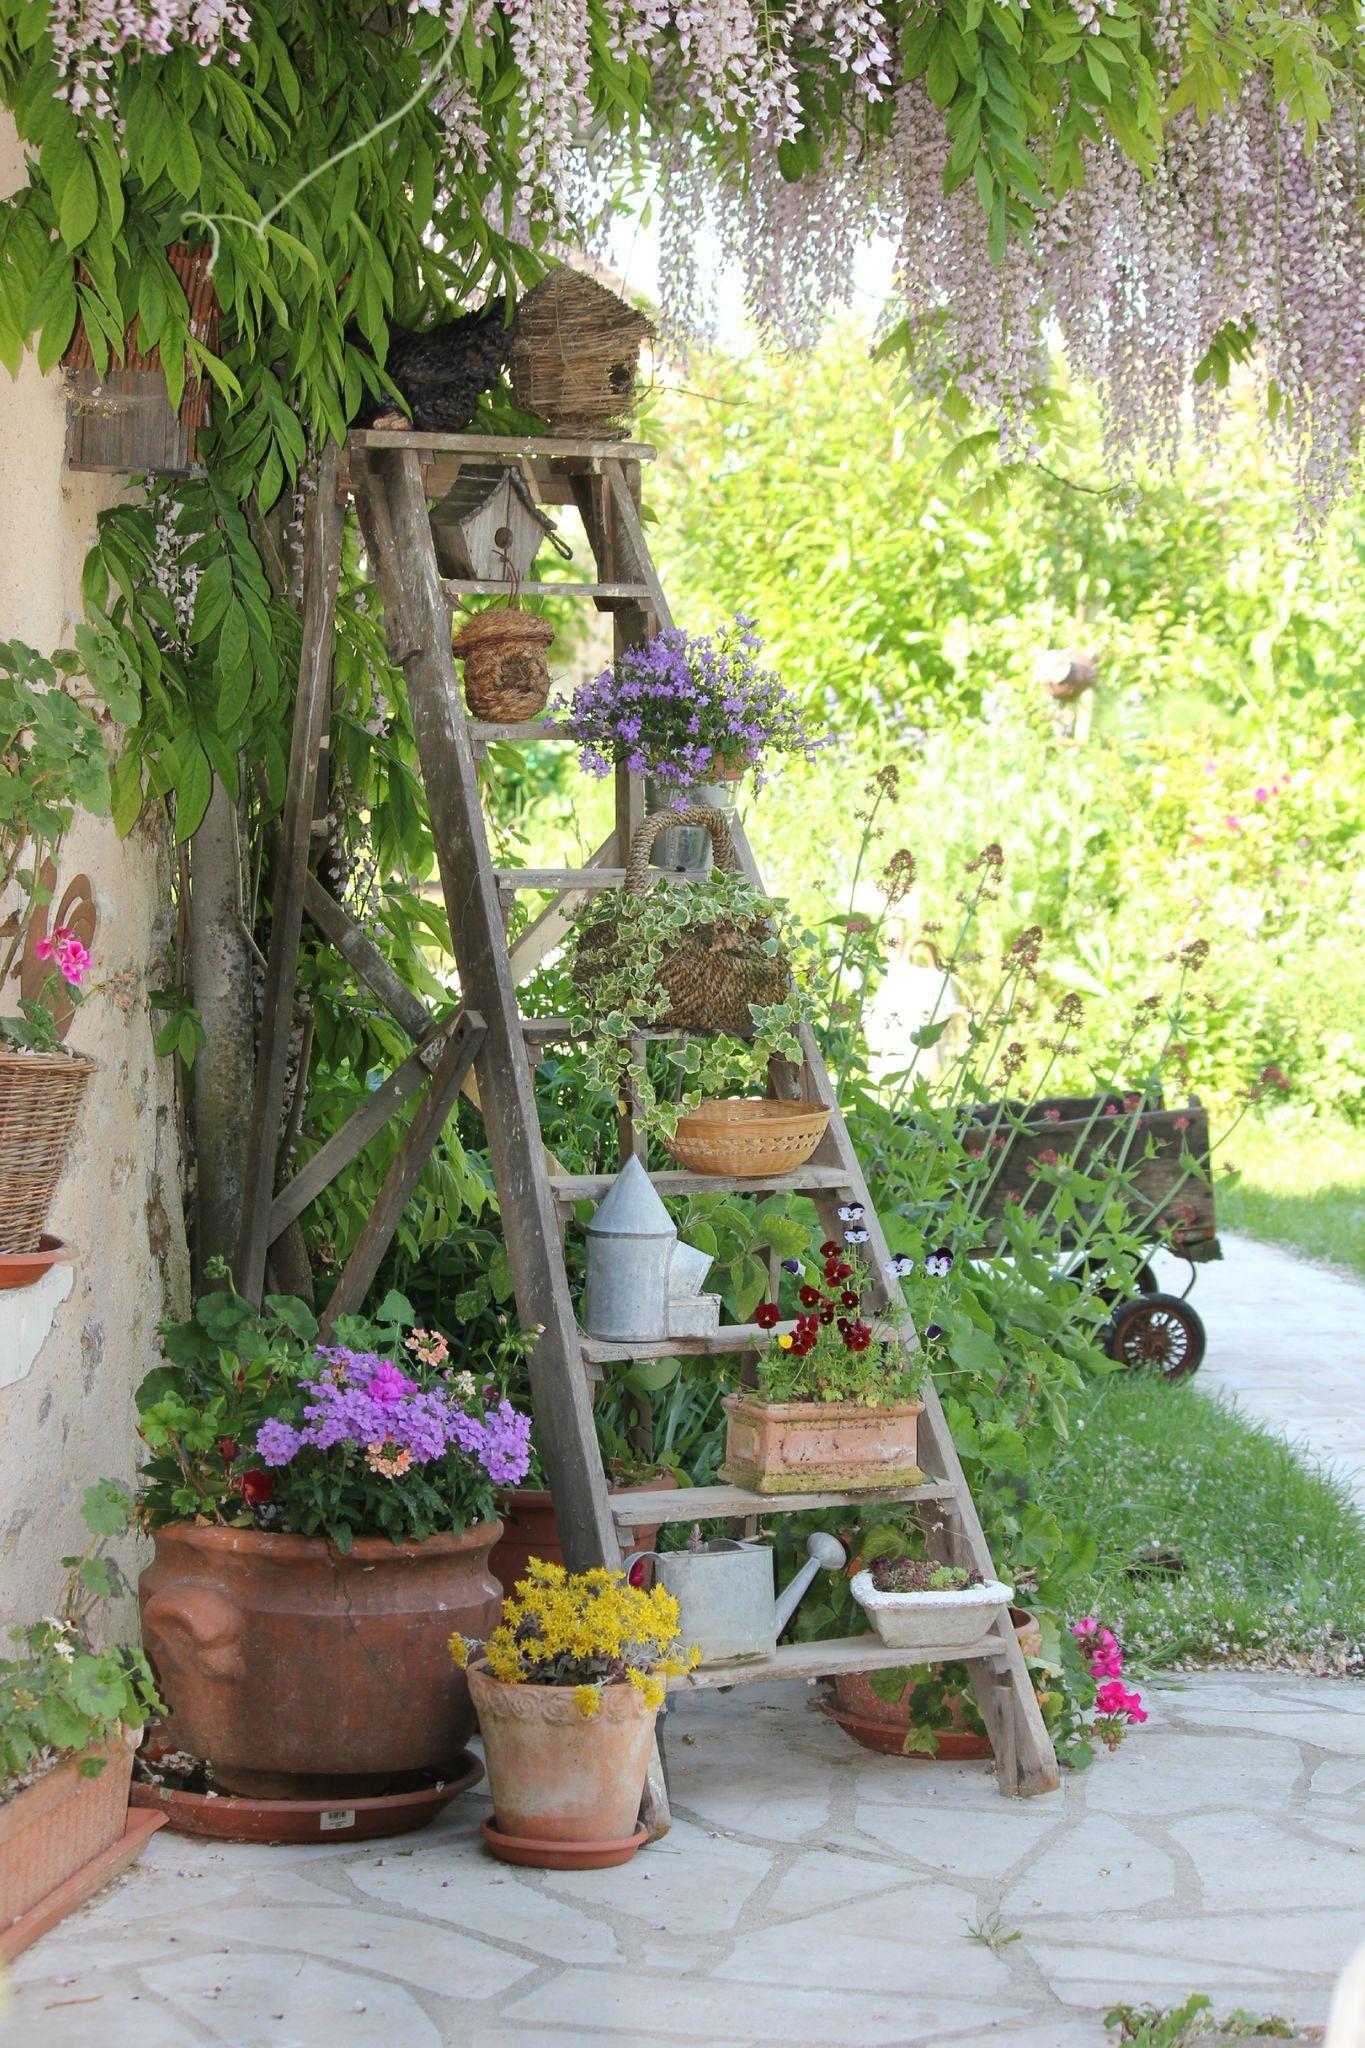 Country Shabby Chic | Decoration Jardin, Idées De Jardin ... concernant Idee Deco Jardin